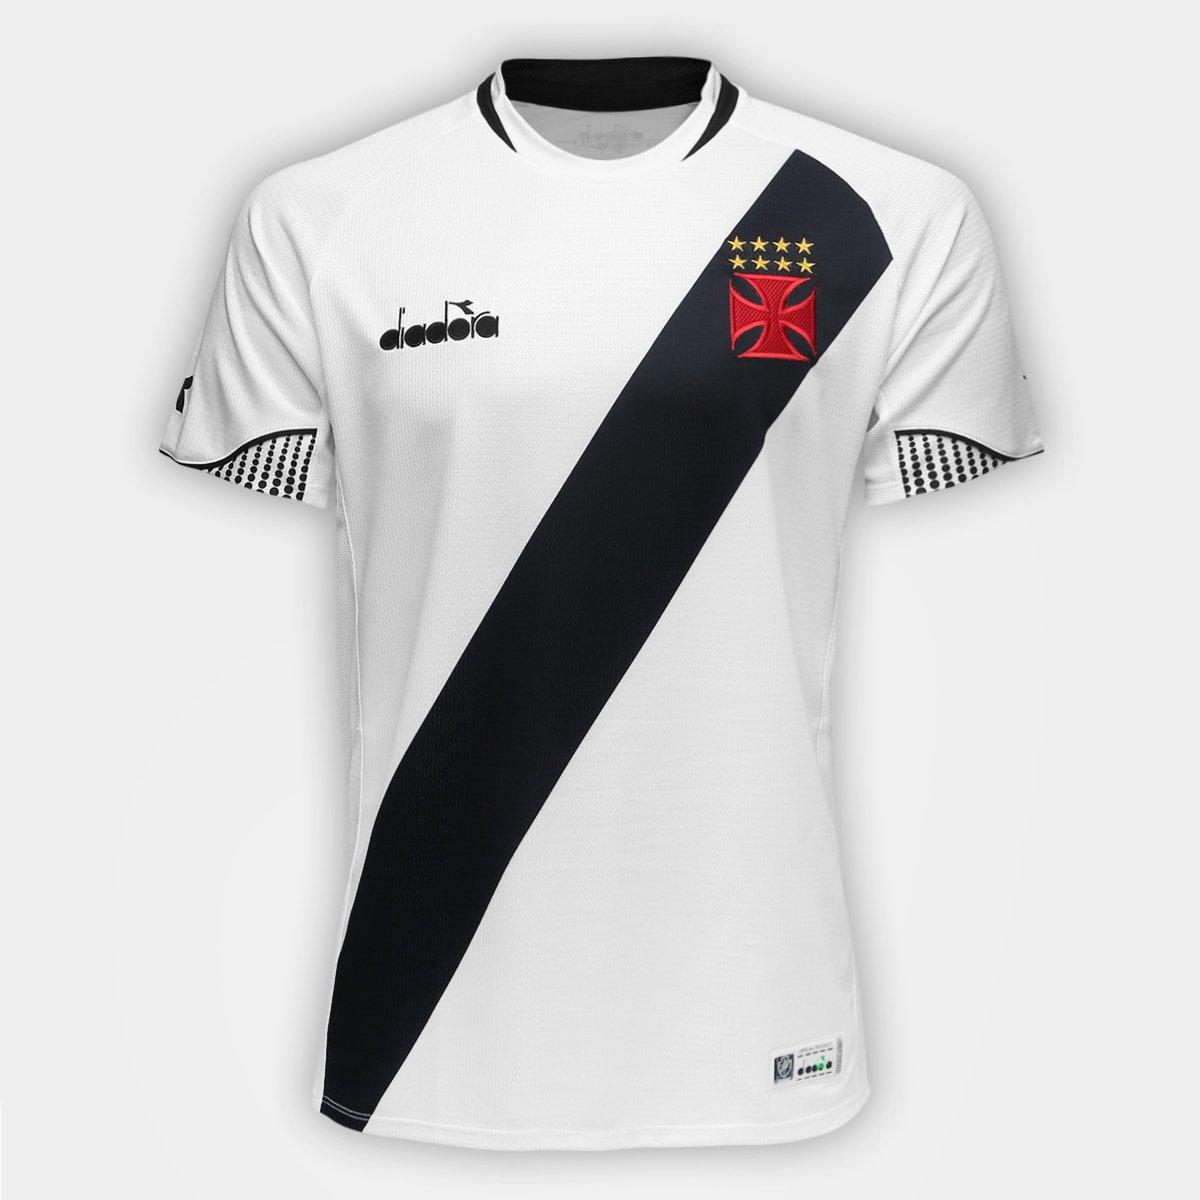 33442c7ae918b Camisa Vasco II 2018 s n° - Torcedor Diadora Masculina - Branco - Compre  Agora